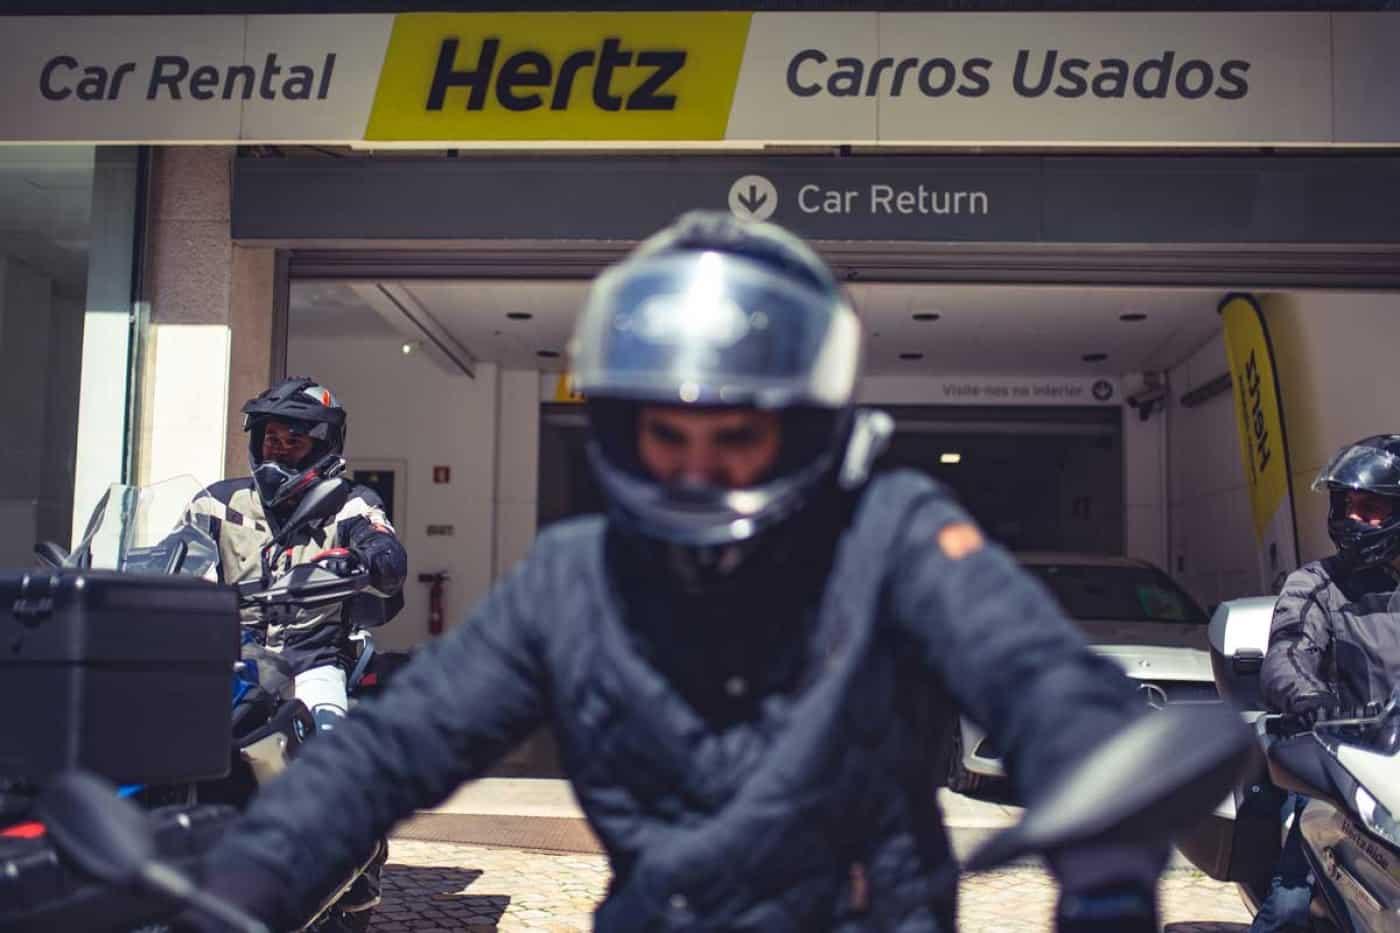 Hertz Ride kooperiert mit Cardo